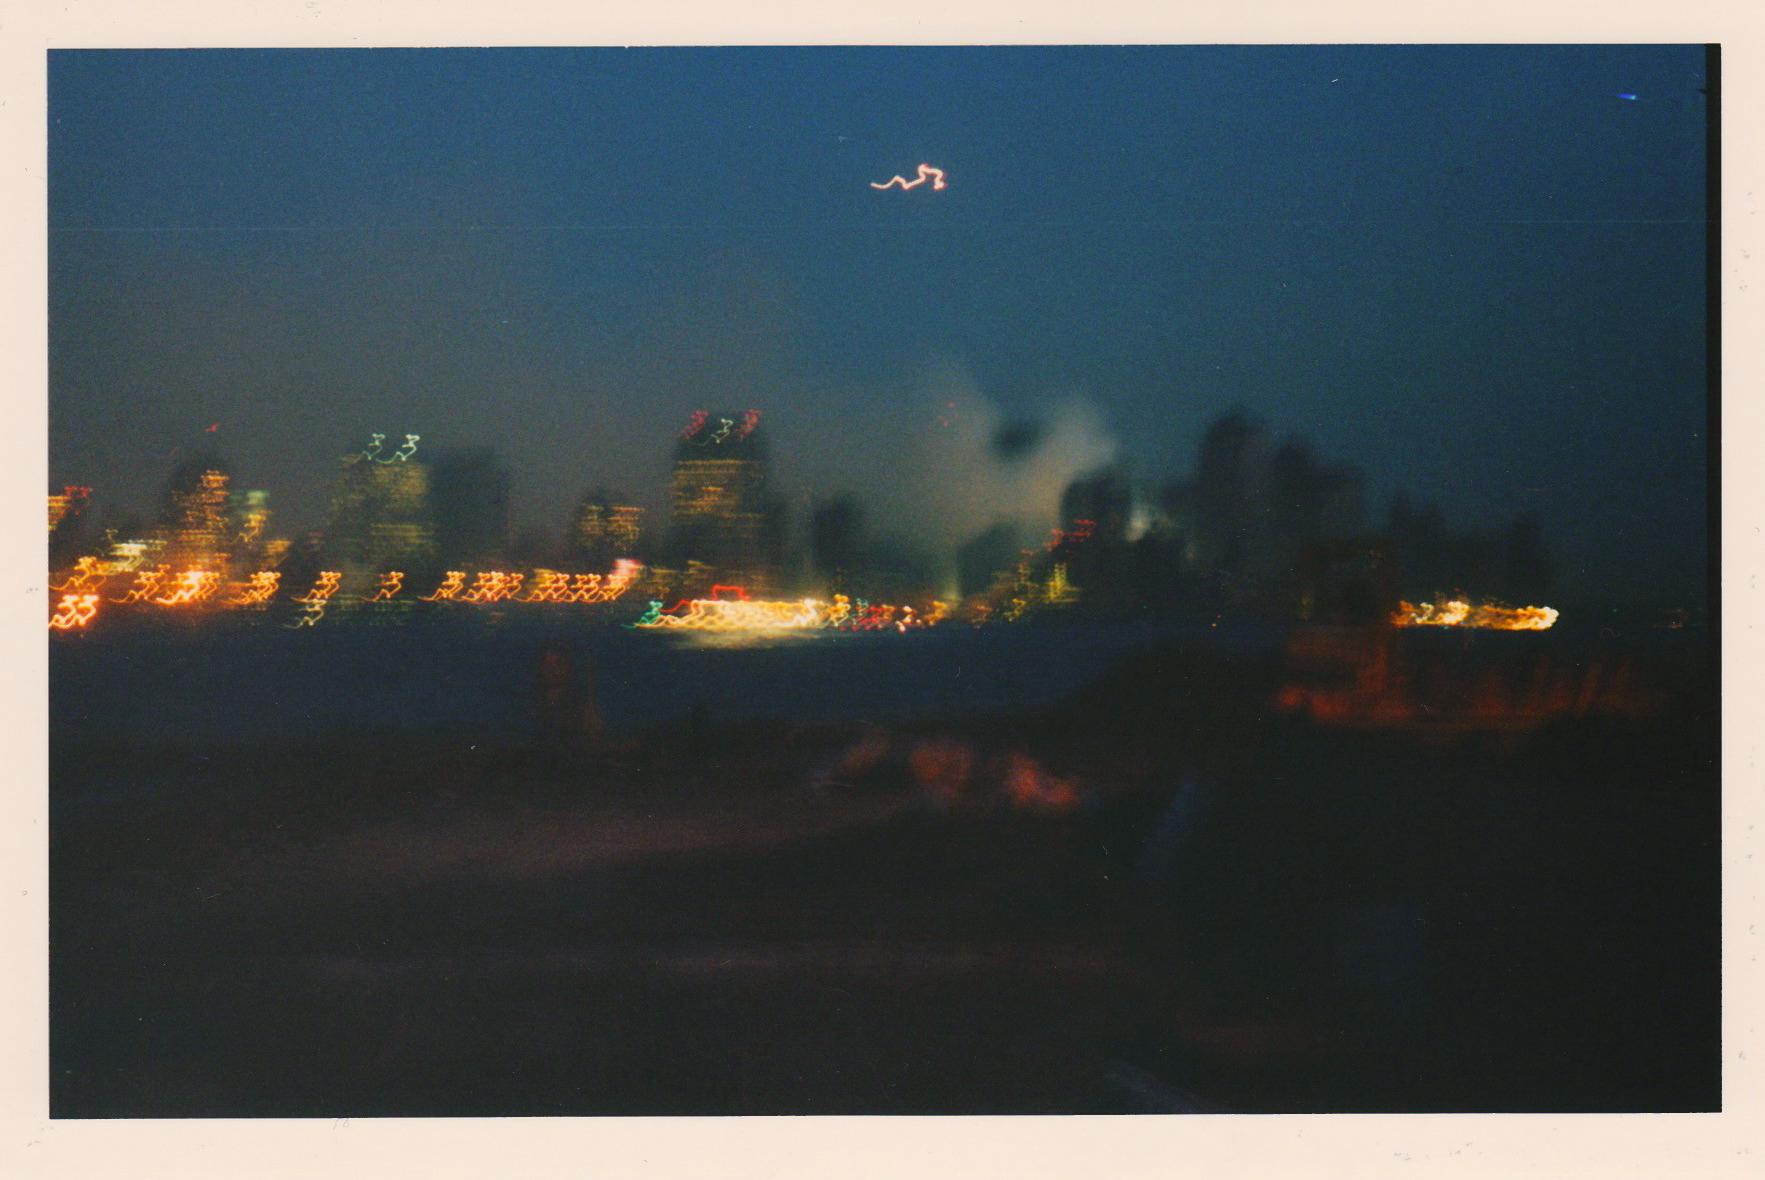 View of the Manhatten skyline from Hoboken